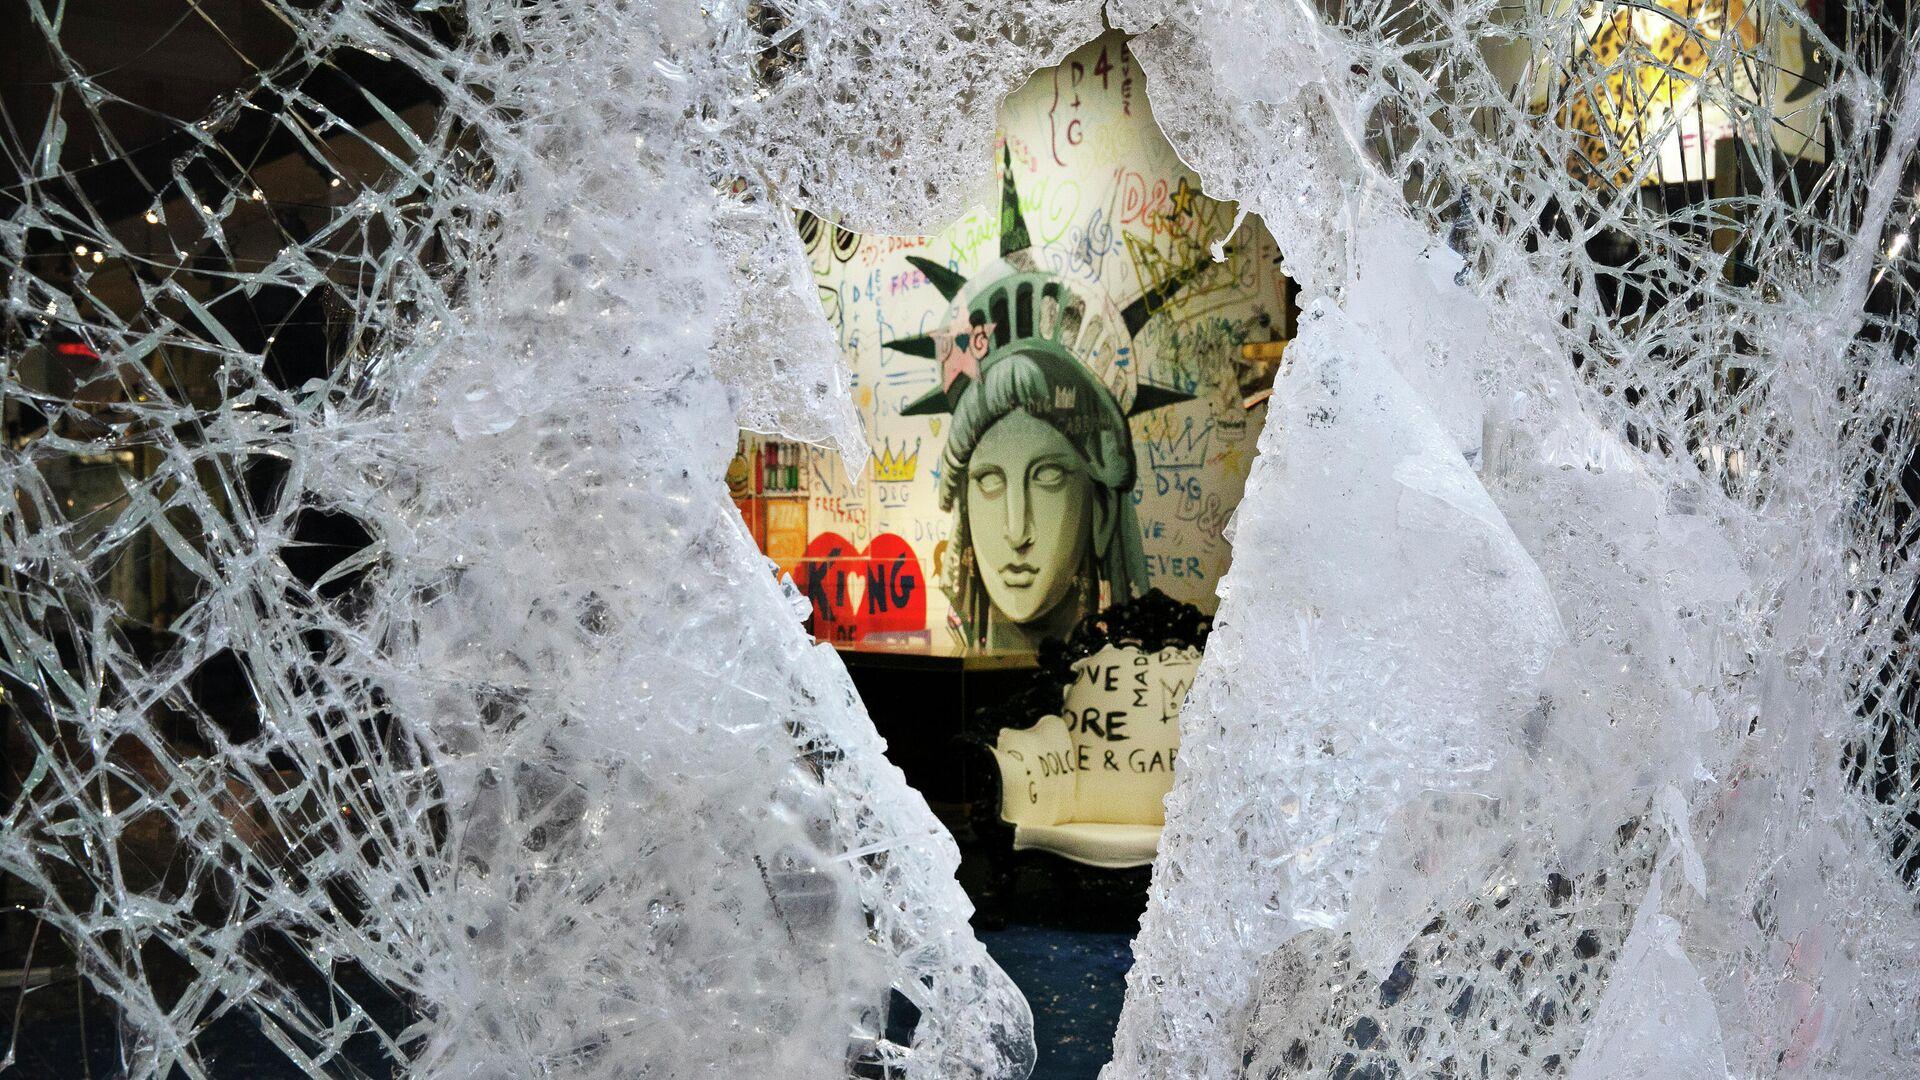 Разбитая витрина магазина Dolce and Gabbana в Нью-Йорке - РИА Новости, 1920, 21.06.2021